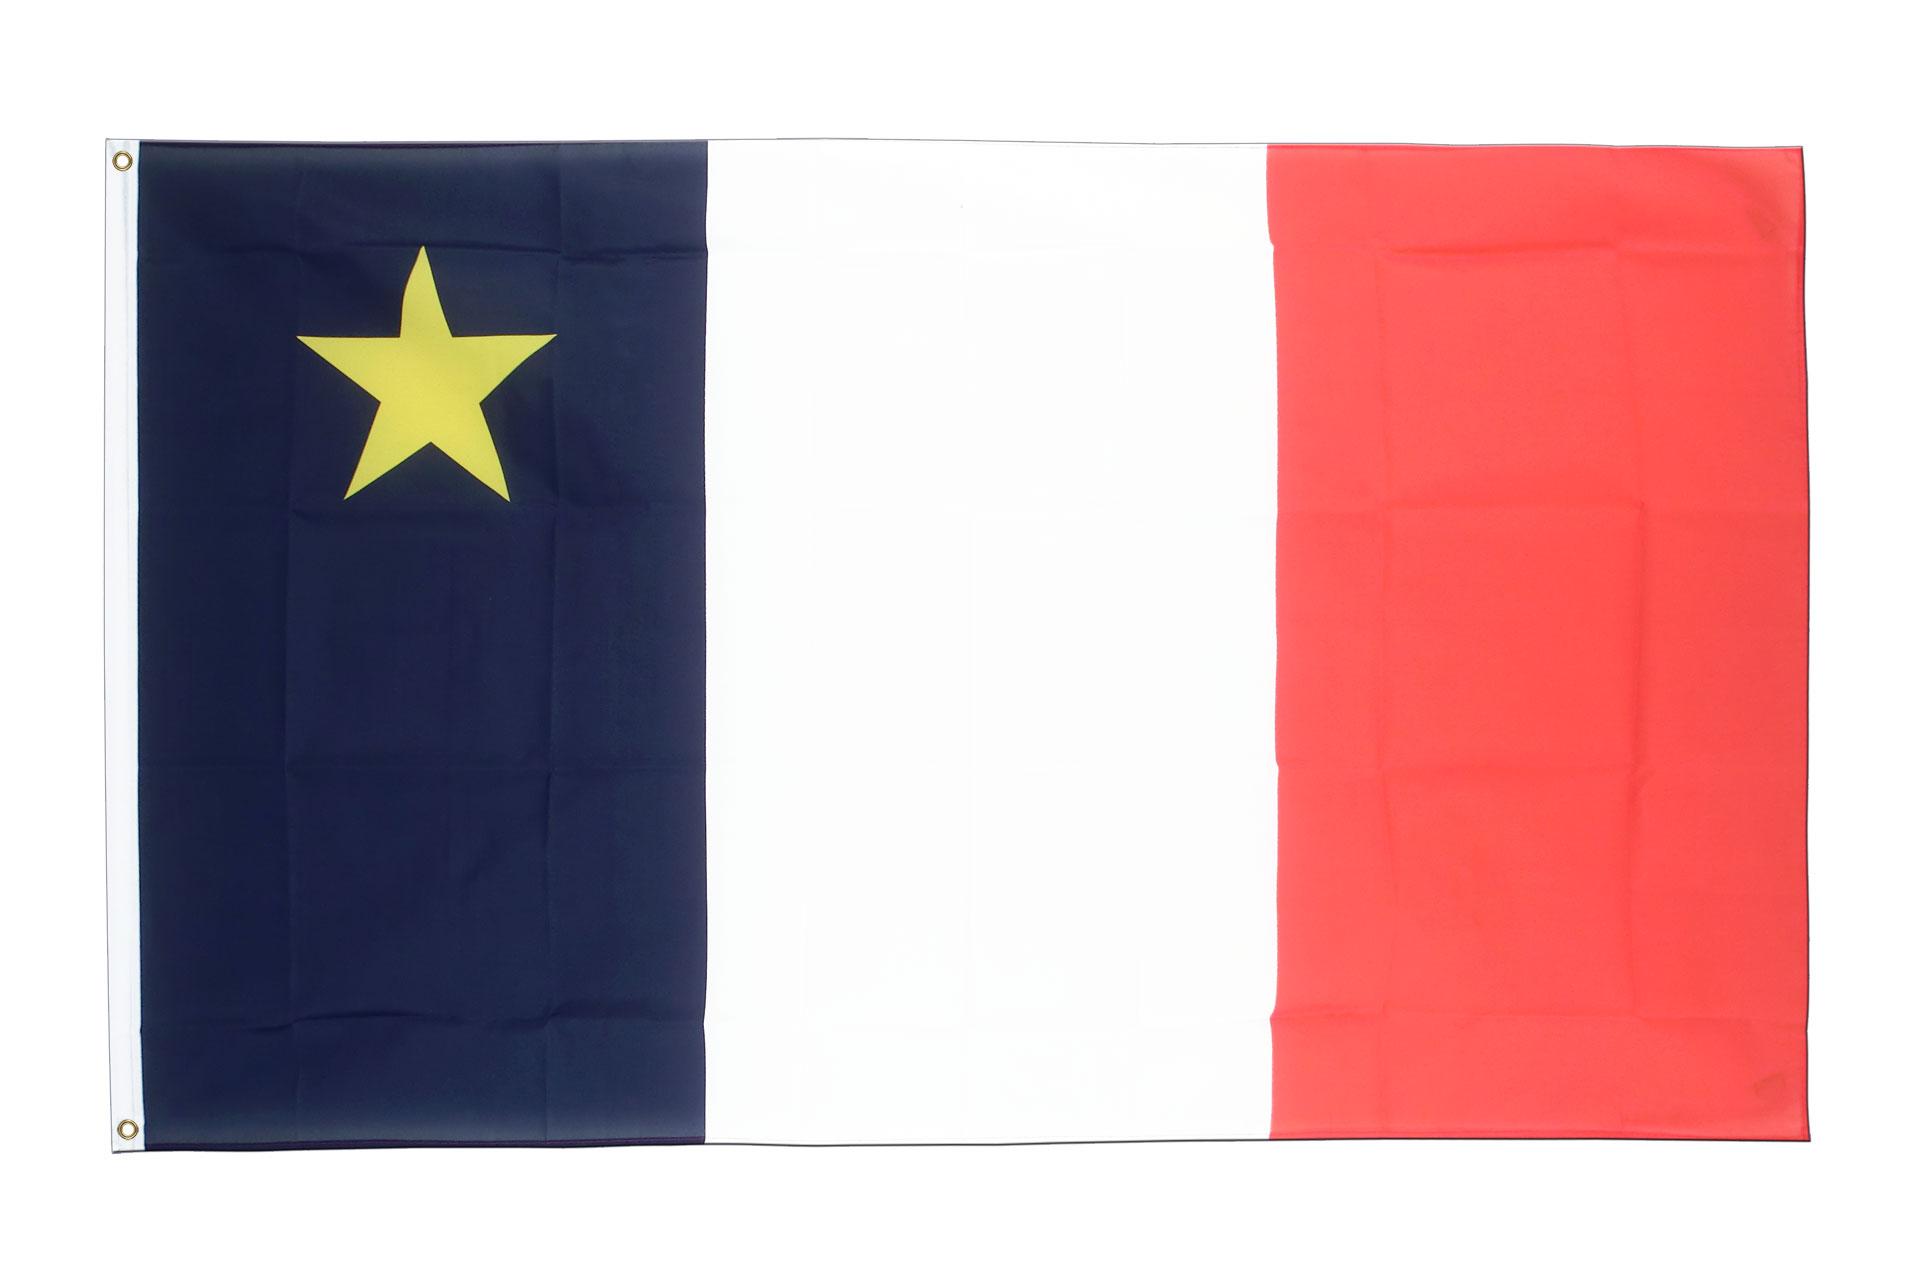 Buy Acadia Flag - 3x5 ft (90x150 cm) - Royal-Flags: https://www.royal-flags.co.uk/acadia-flag-1820.html